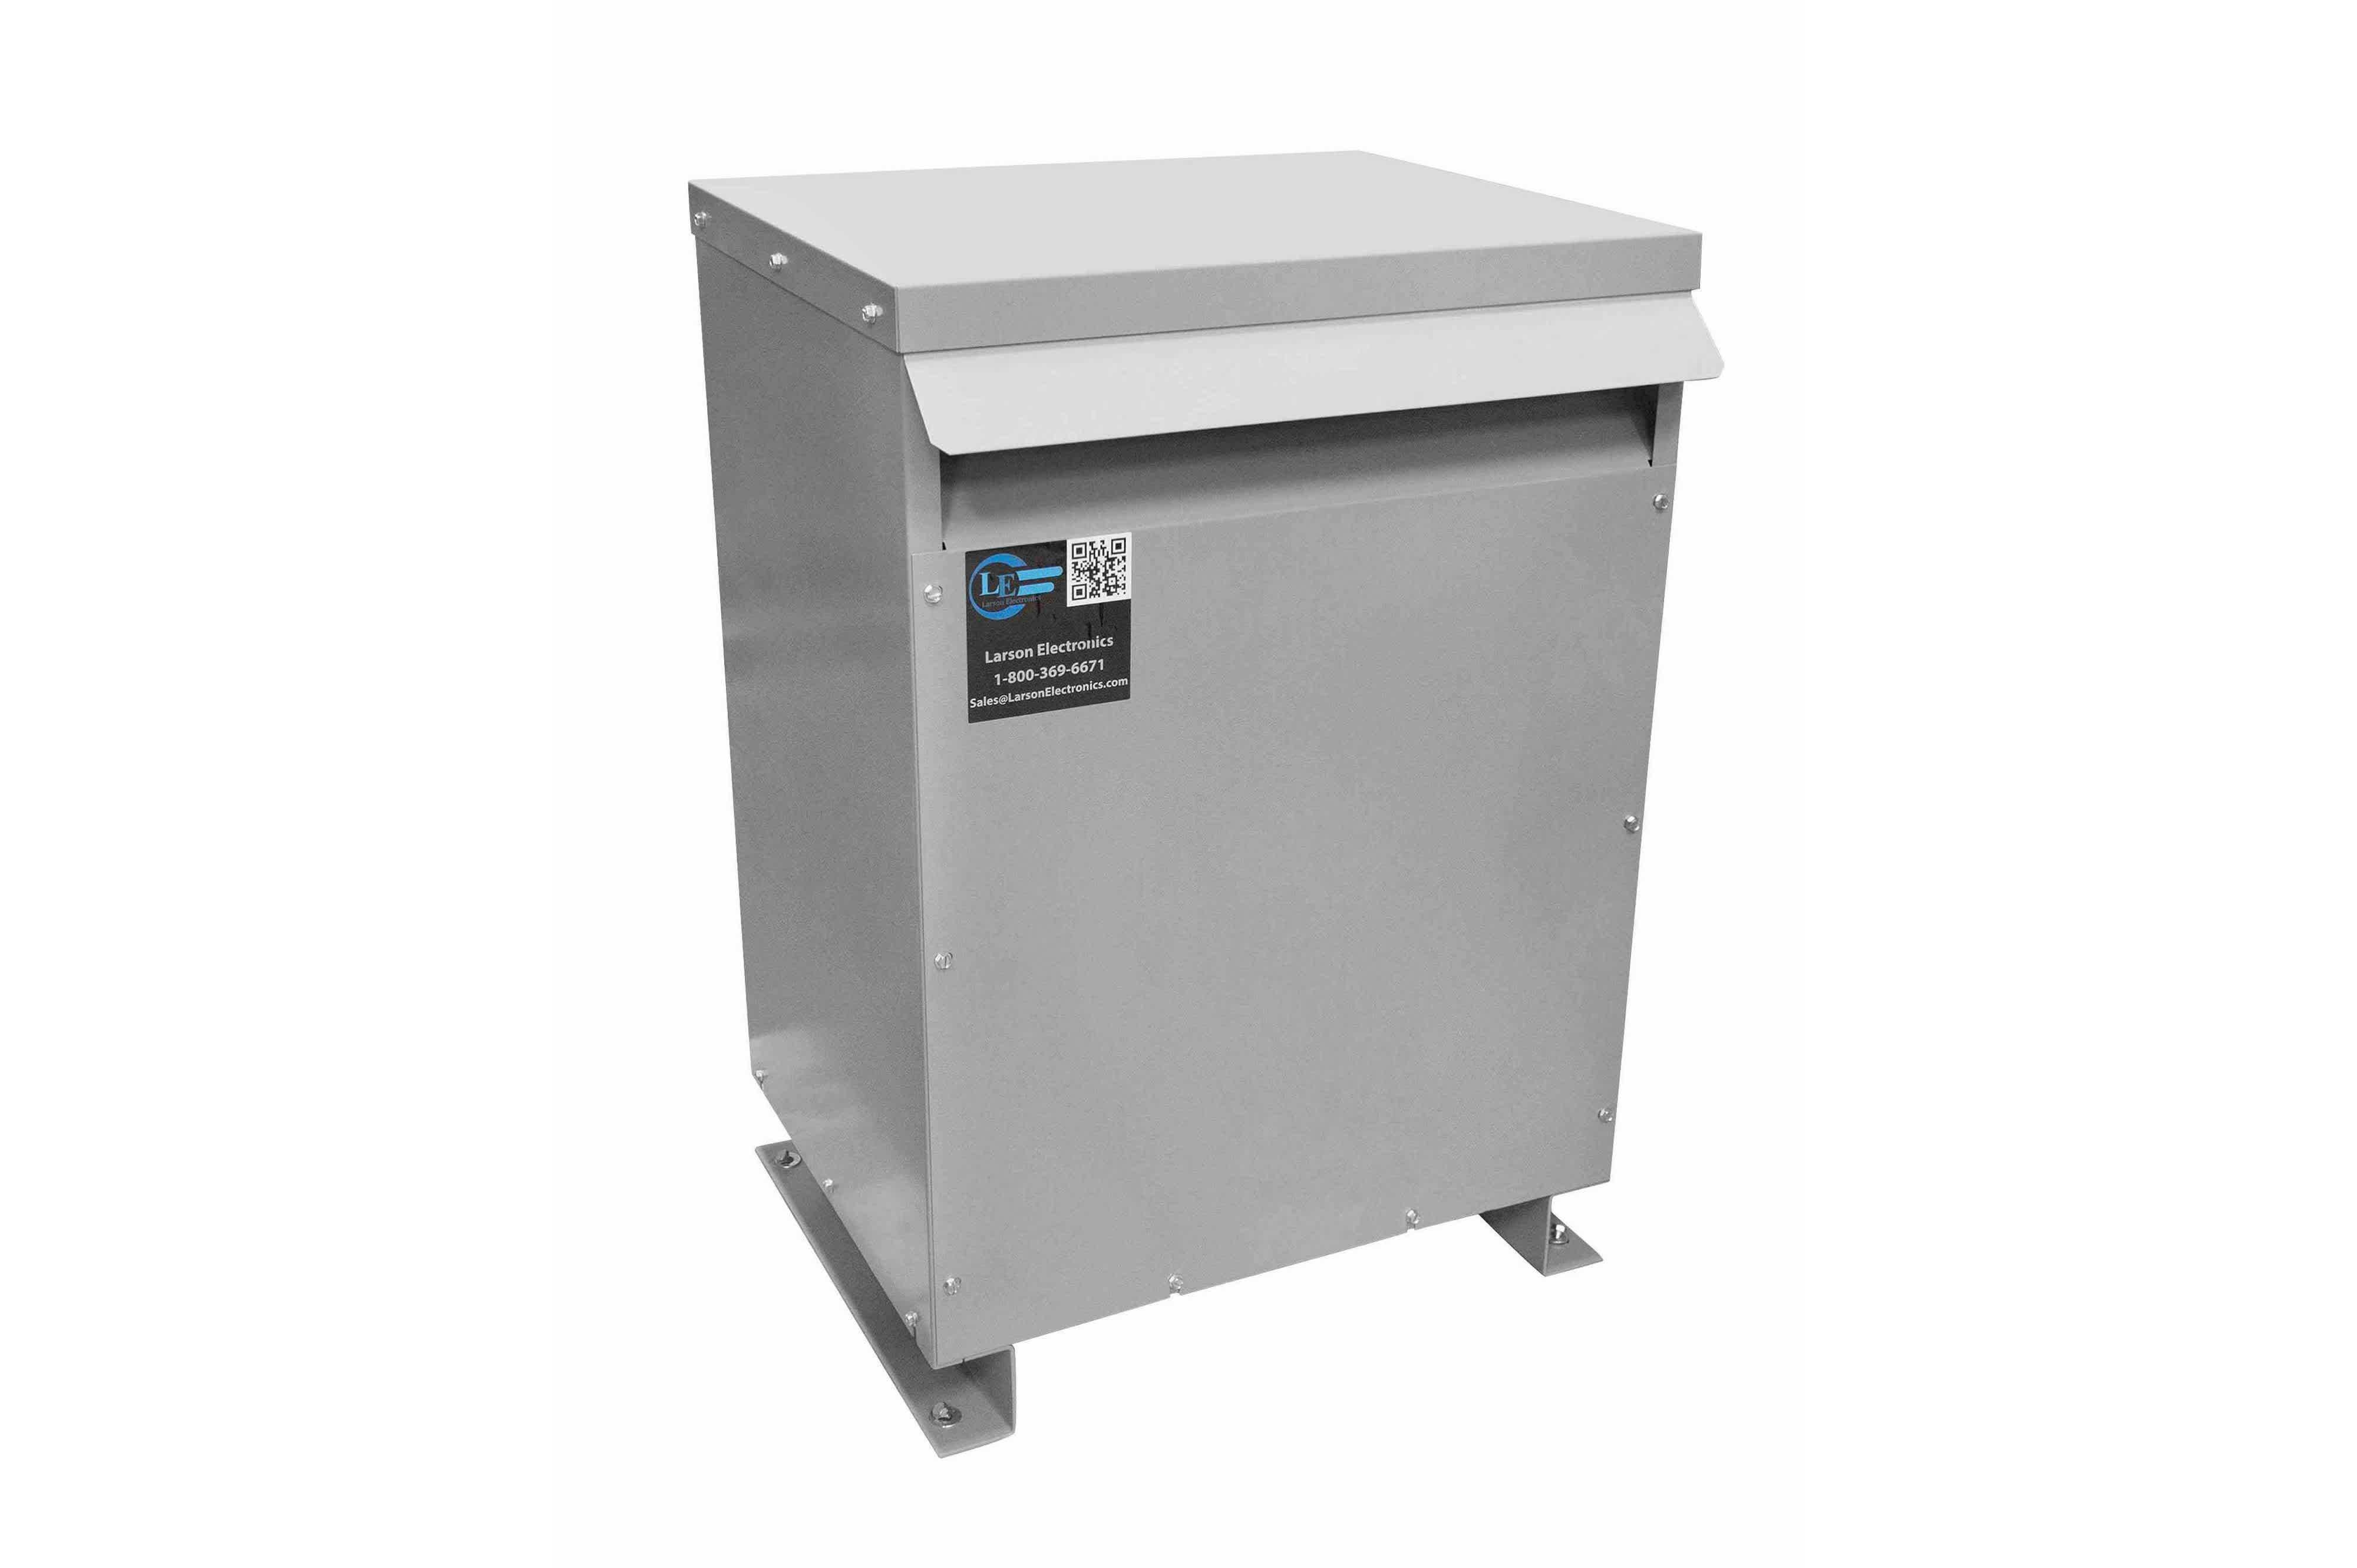 500 kVA 3PH Isolation Transformer, 480V Wye Primary, 415V Delta Secondary, N3R, Ventilated, 60 Hz